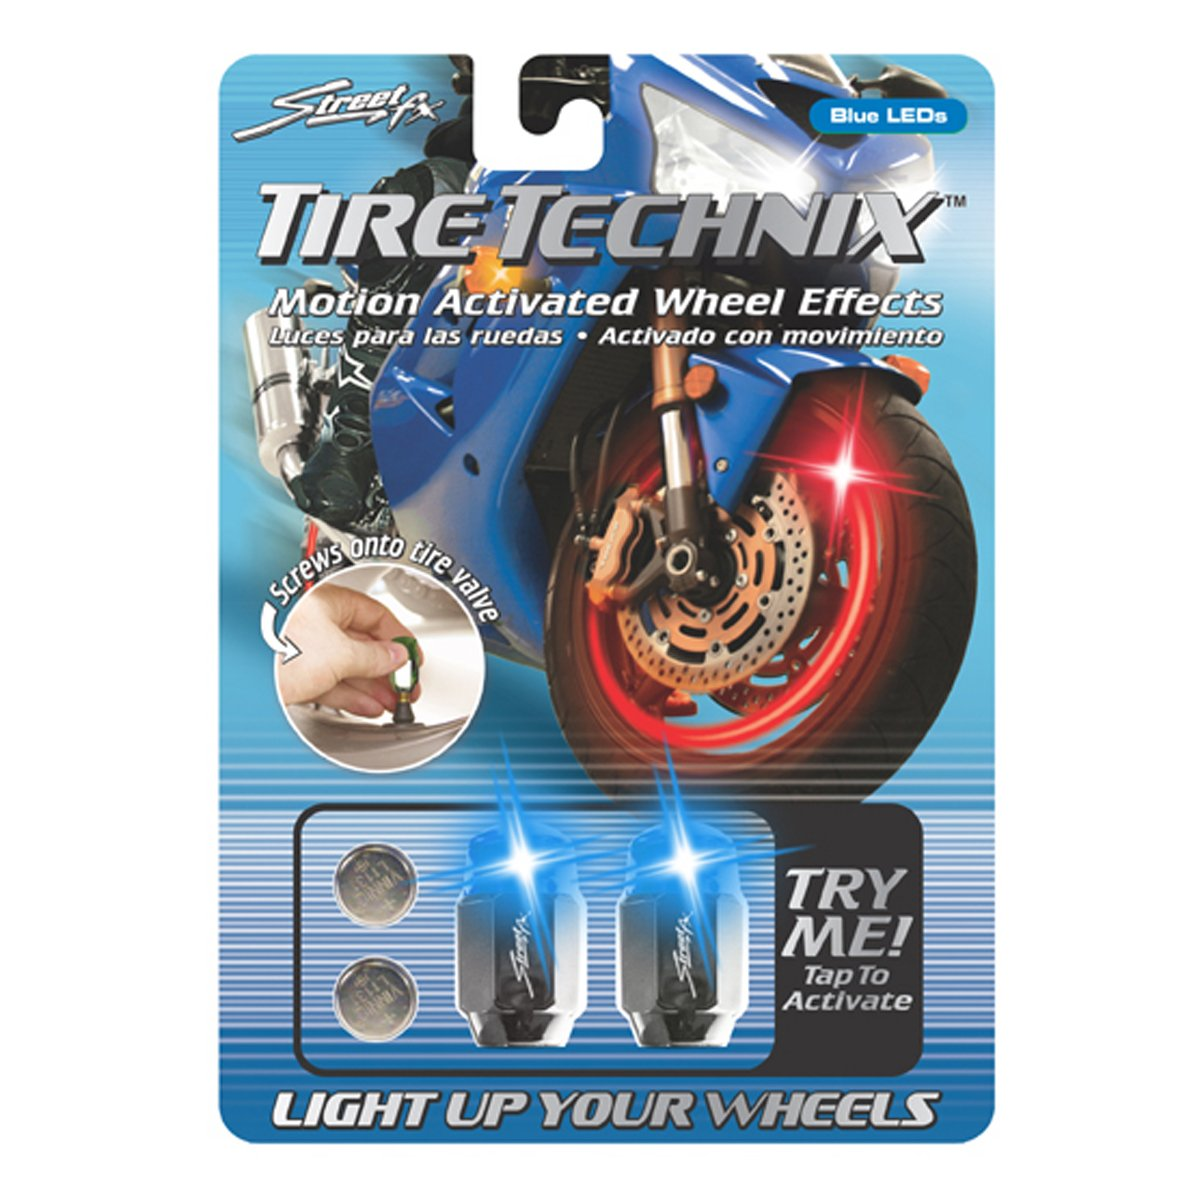 Street FX 1042198 Tire Technix Moto Hex Blue Light